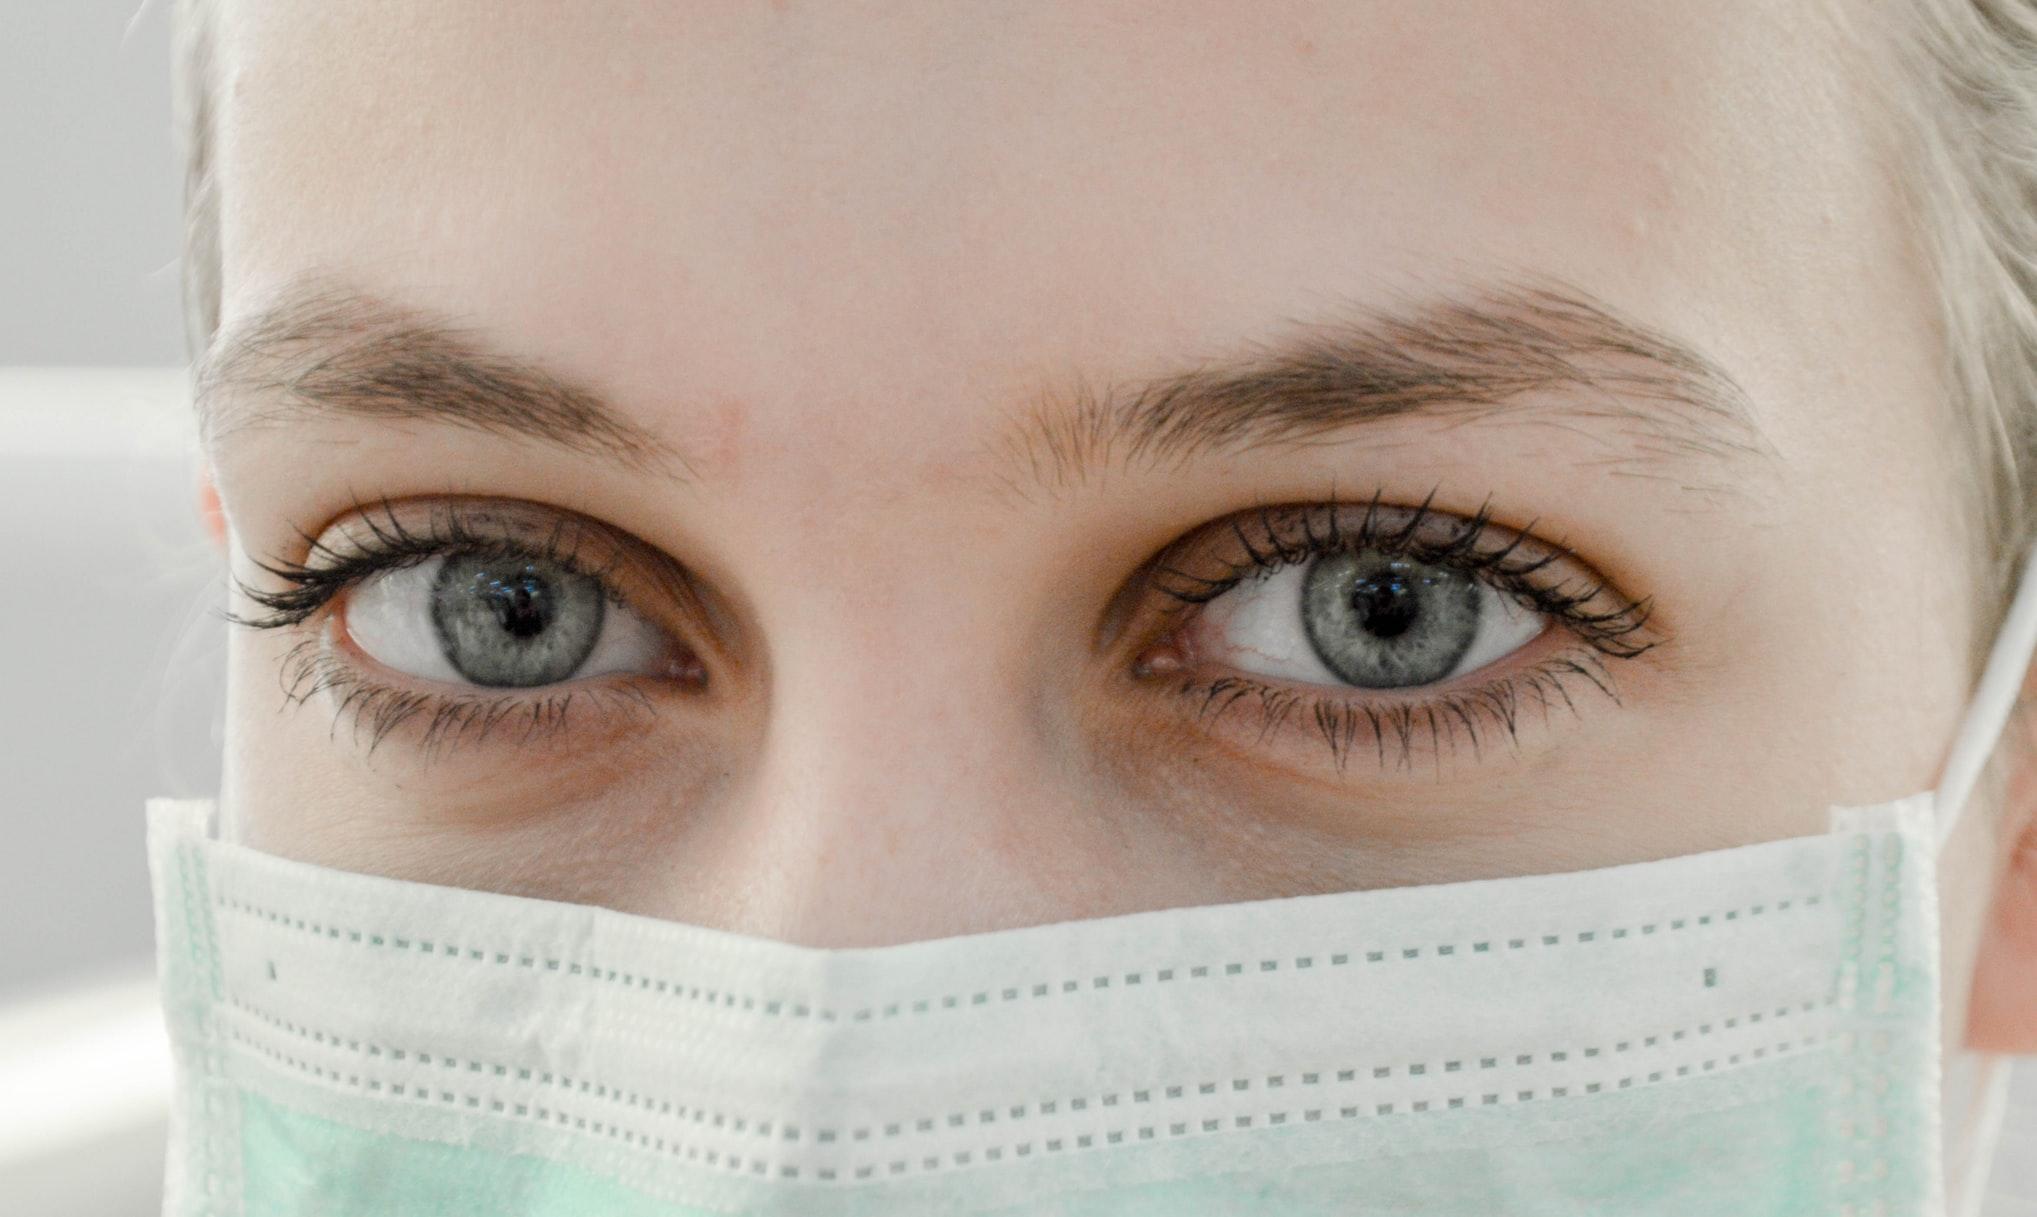 masques FFP2, NK95 et masques chirurgicaux disponibles Avril 2020